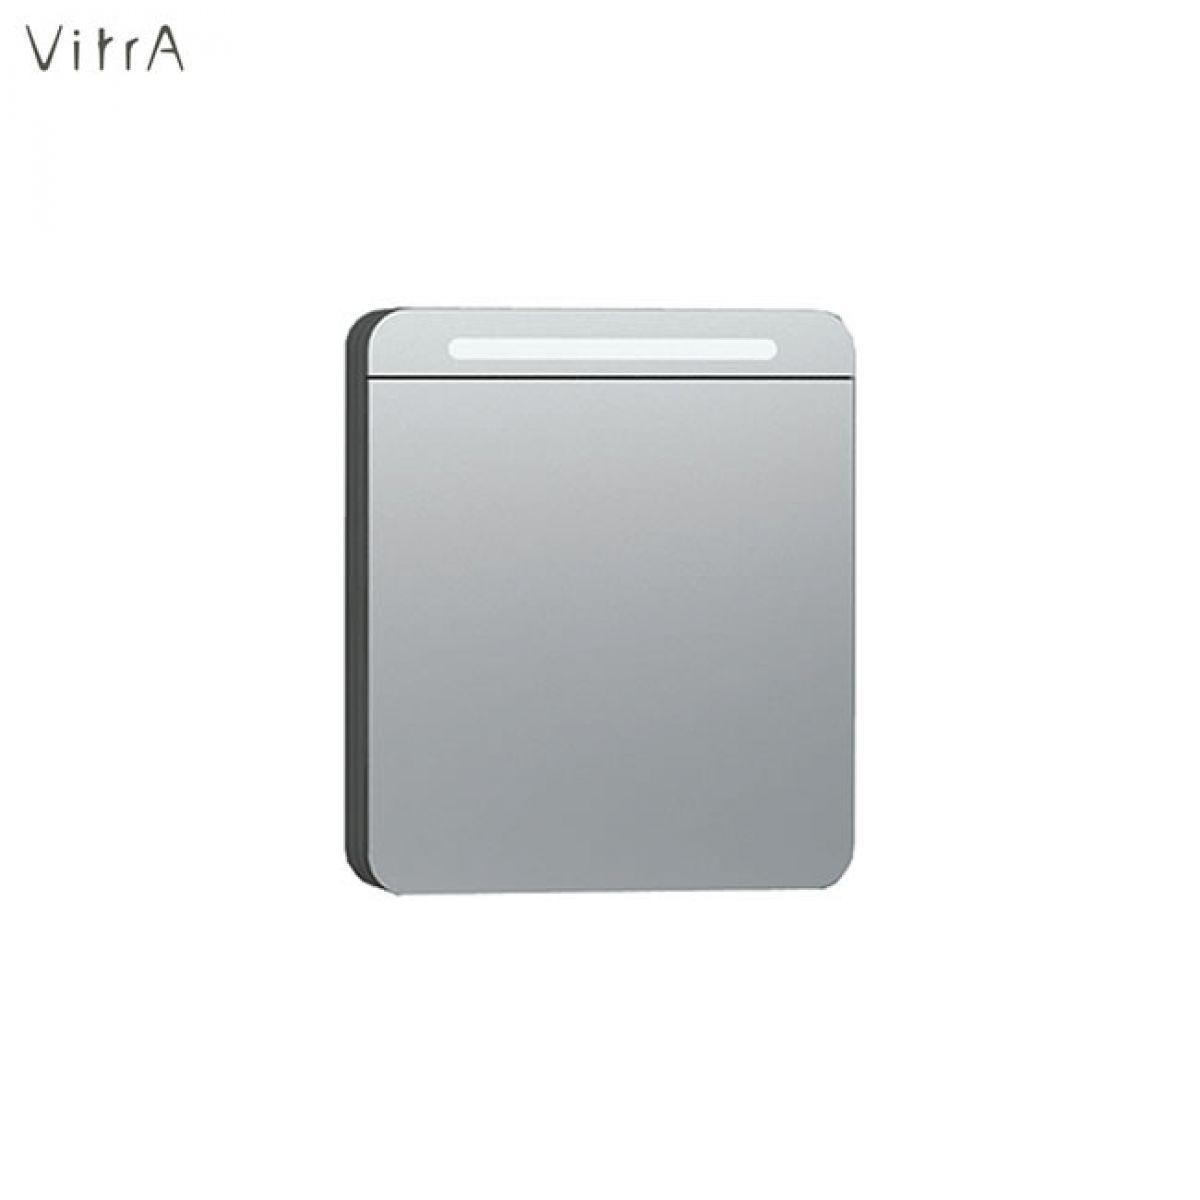 Vitra Nest Single Door 60cm Mirror Cabinet With Led